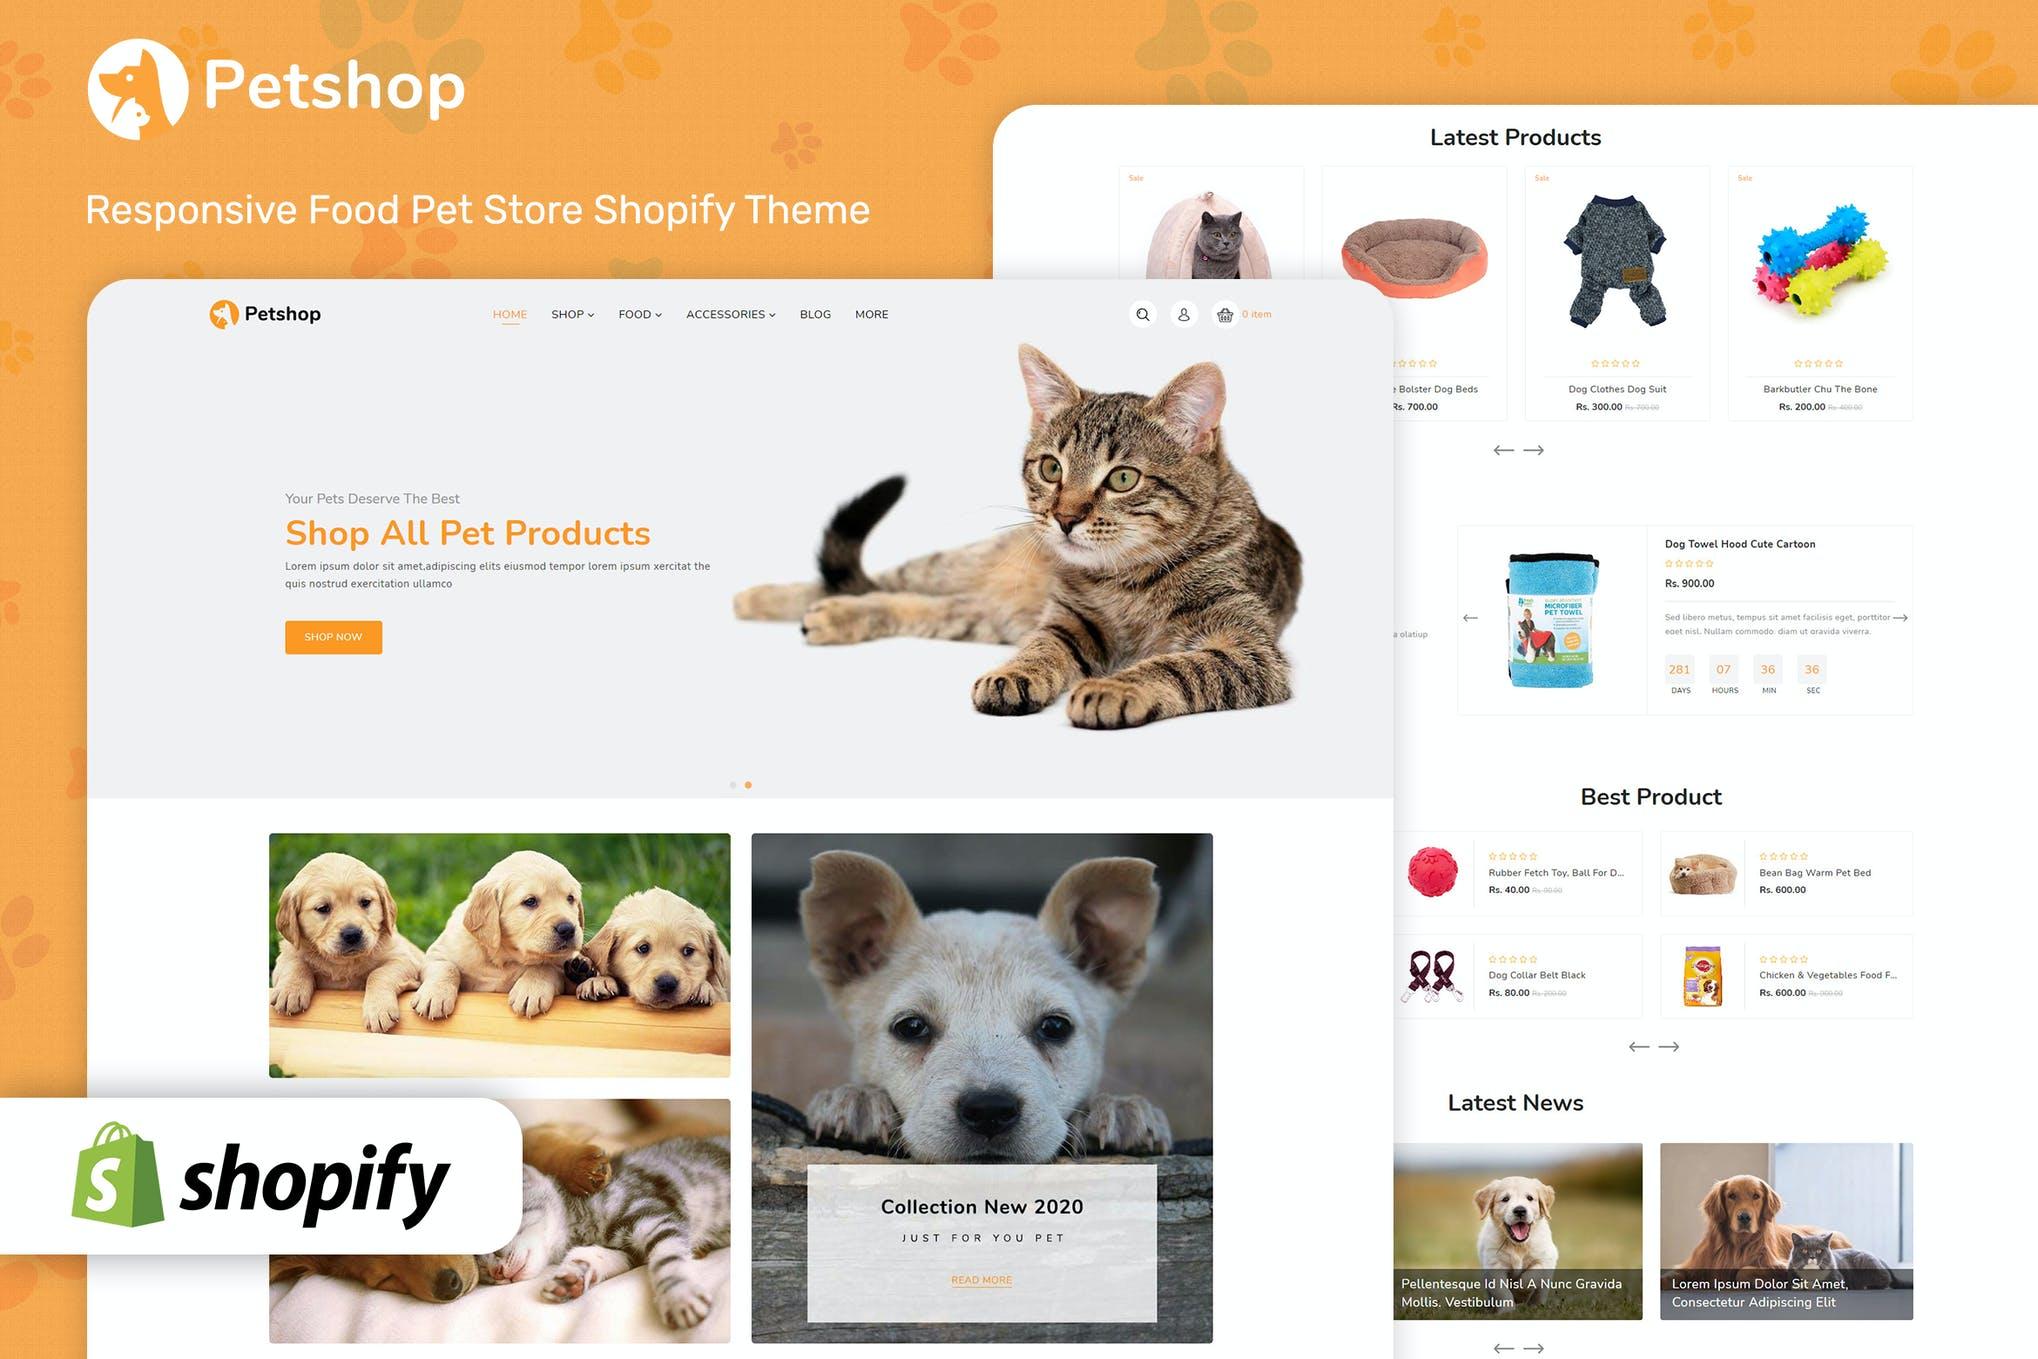 宠物商城风格shopify主题模板Petshop